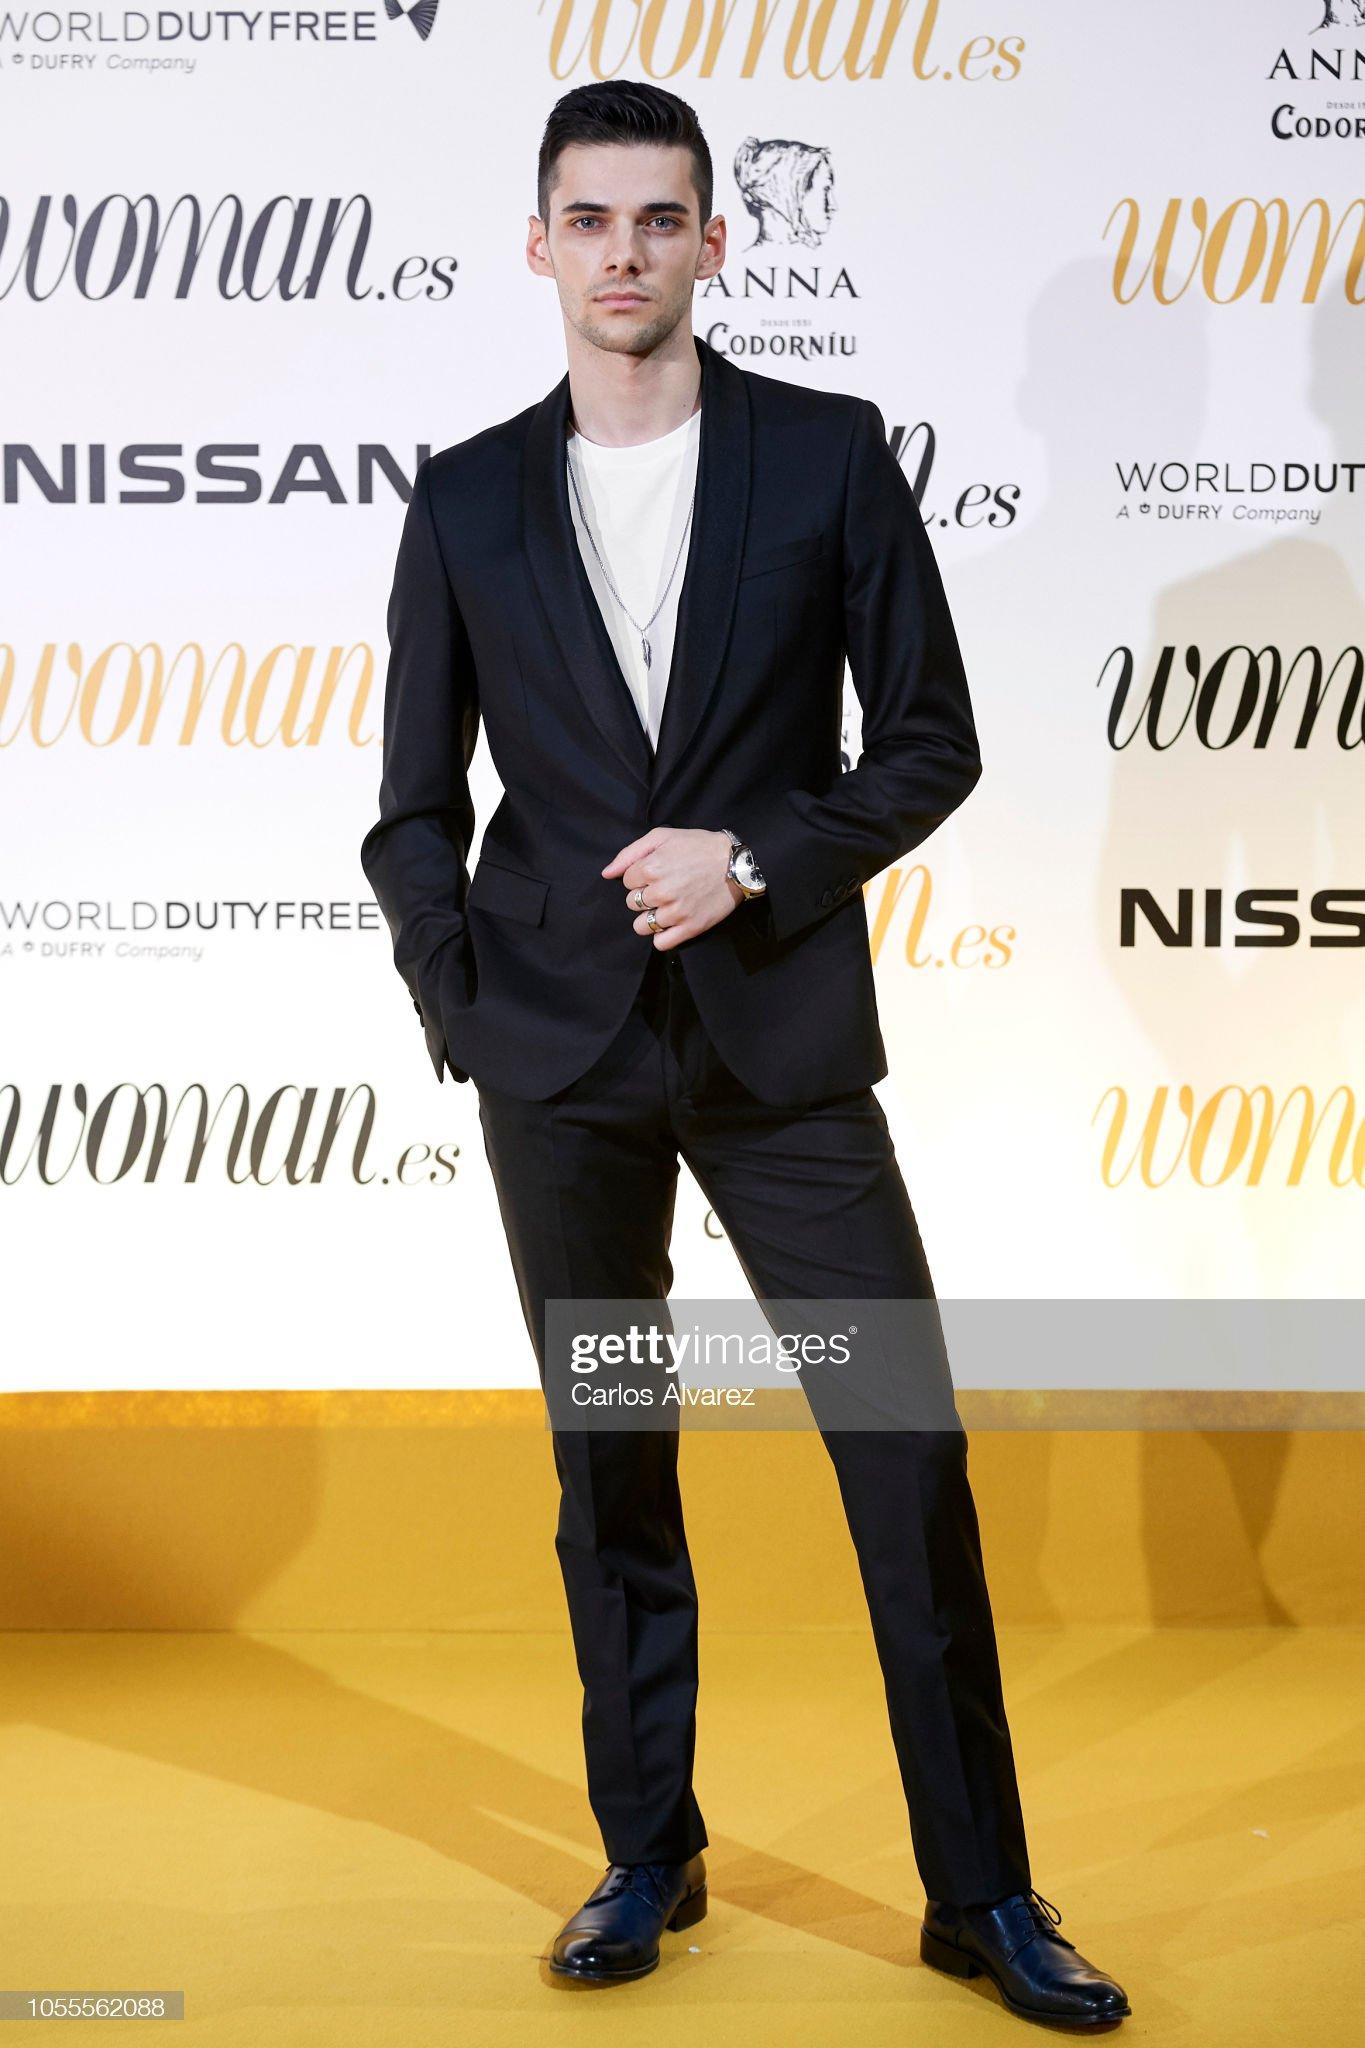 ¿Cuánto mide Álvaro Rico? - Altura Actor-alvaro-rico-attends-woman-awards-2018-at-the-casino-de-madrid-picture-id1055562088?s=2048x2048